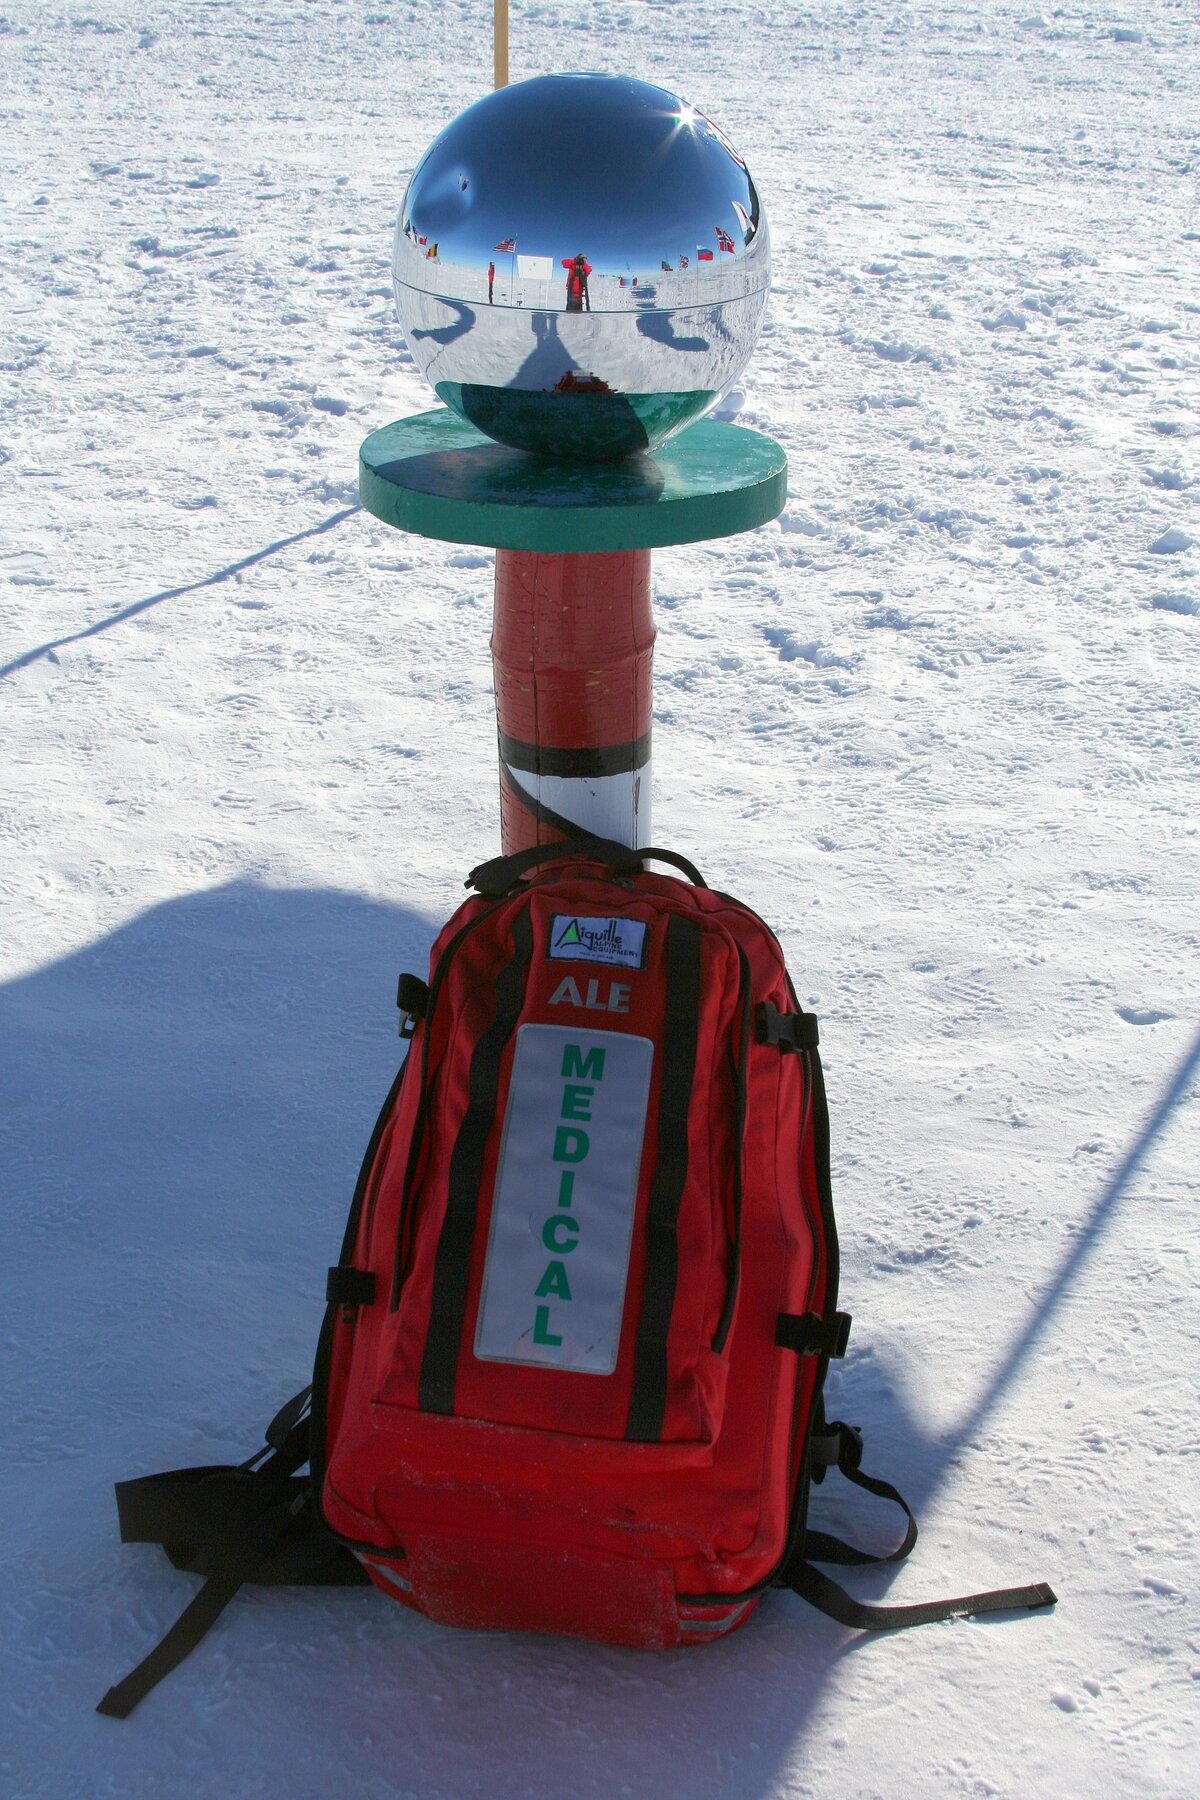 ALE medic accompanies all South Pole flights